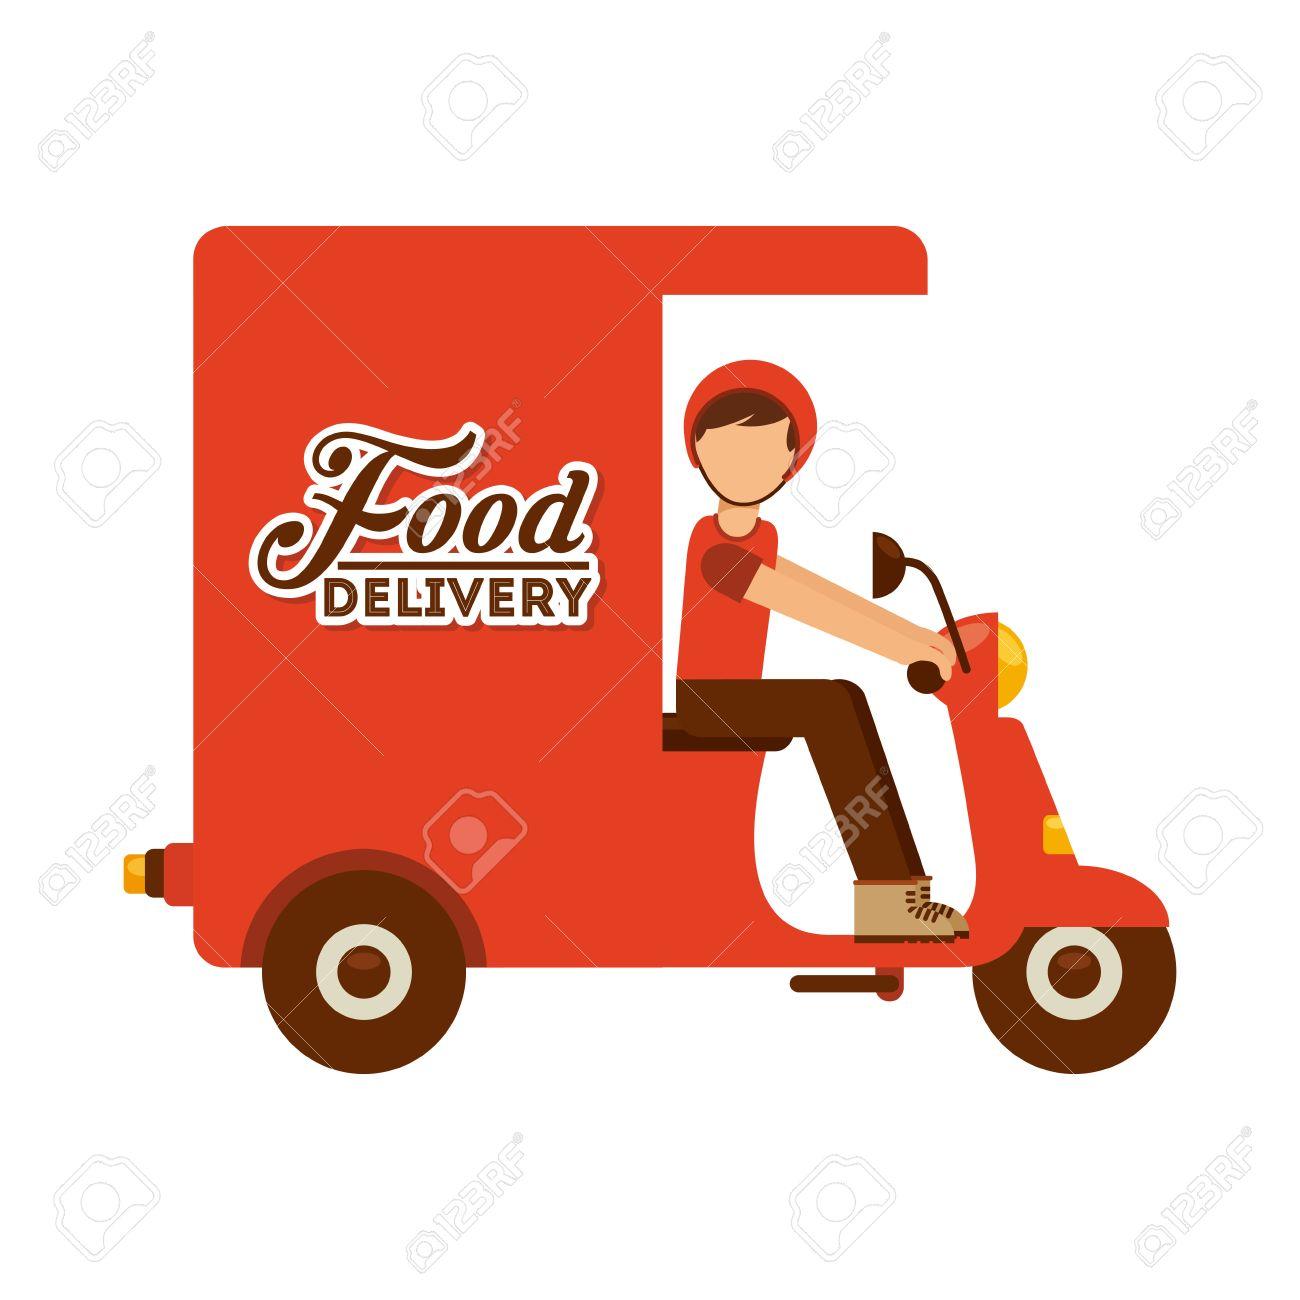 food delivery design, vector illustration eps10 graphic.